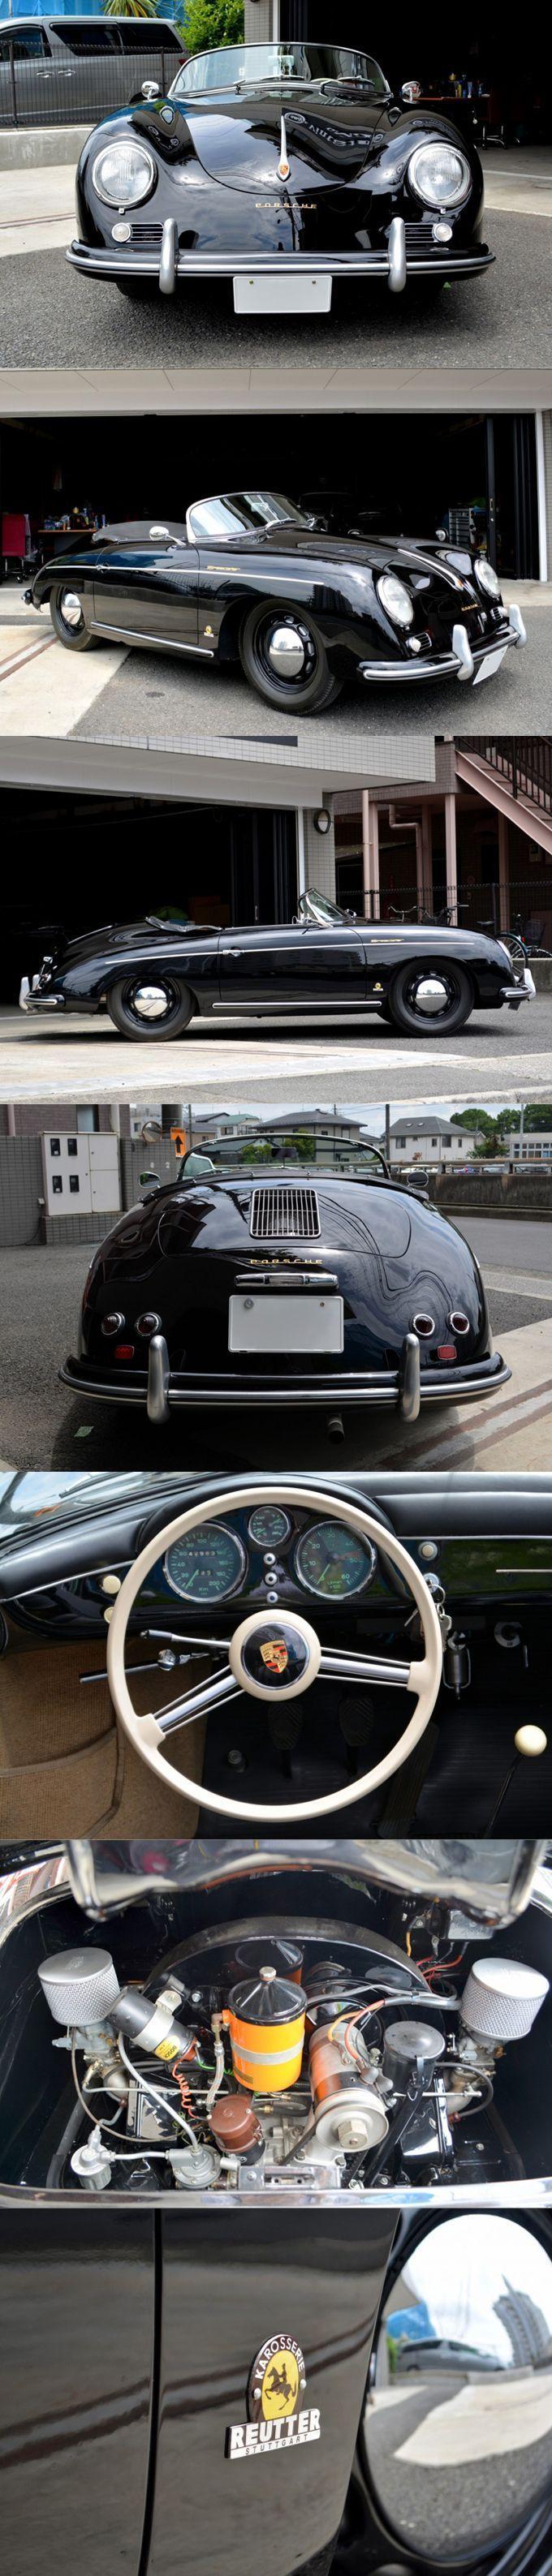 1955 #Porsche 356 Speedster Reutter / pre A / 43.000km / vintage-#car.net / Japan / #black / 17-263